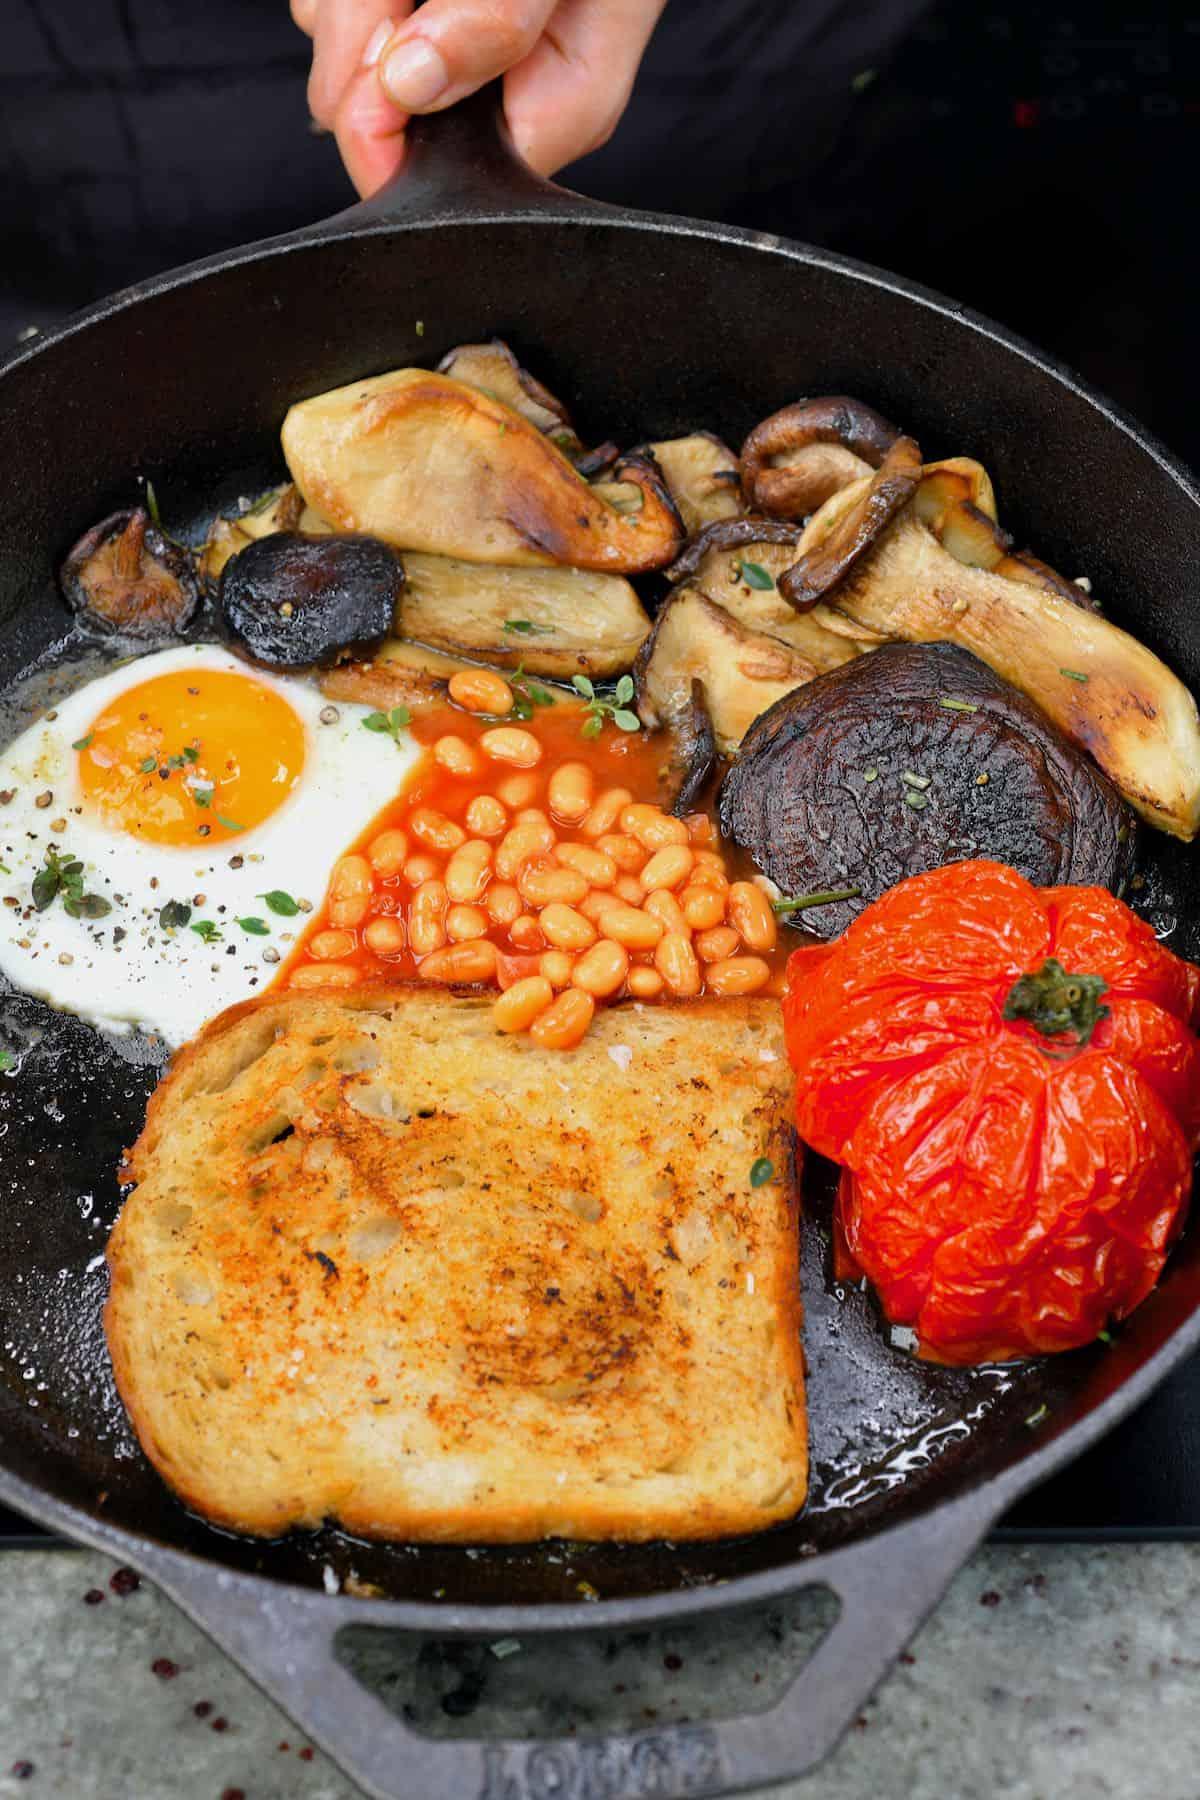 English breakfast in a pan